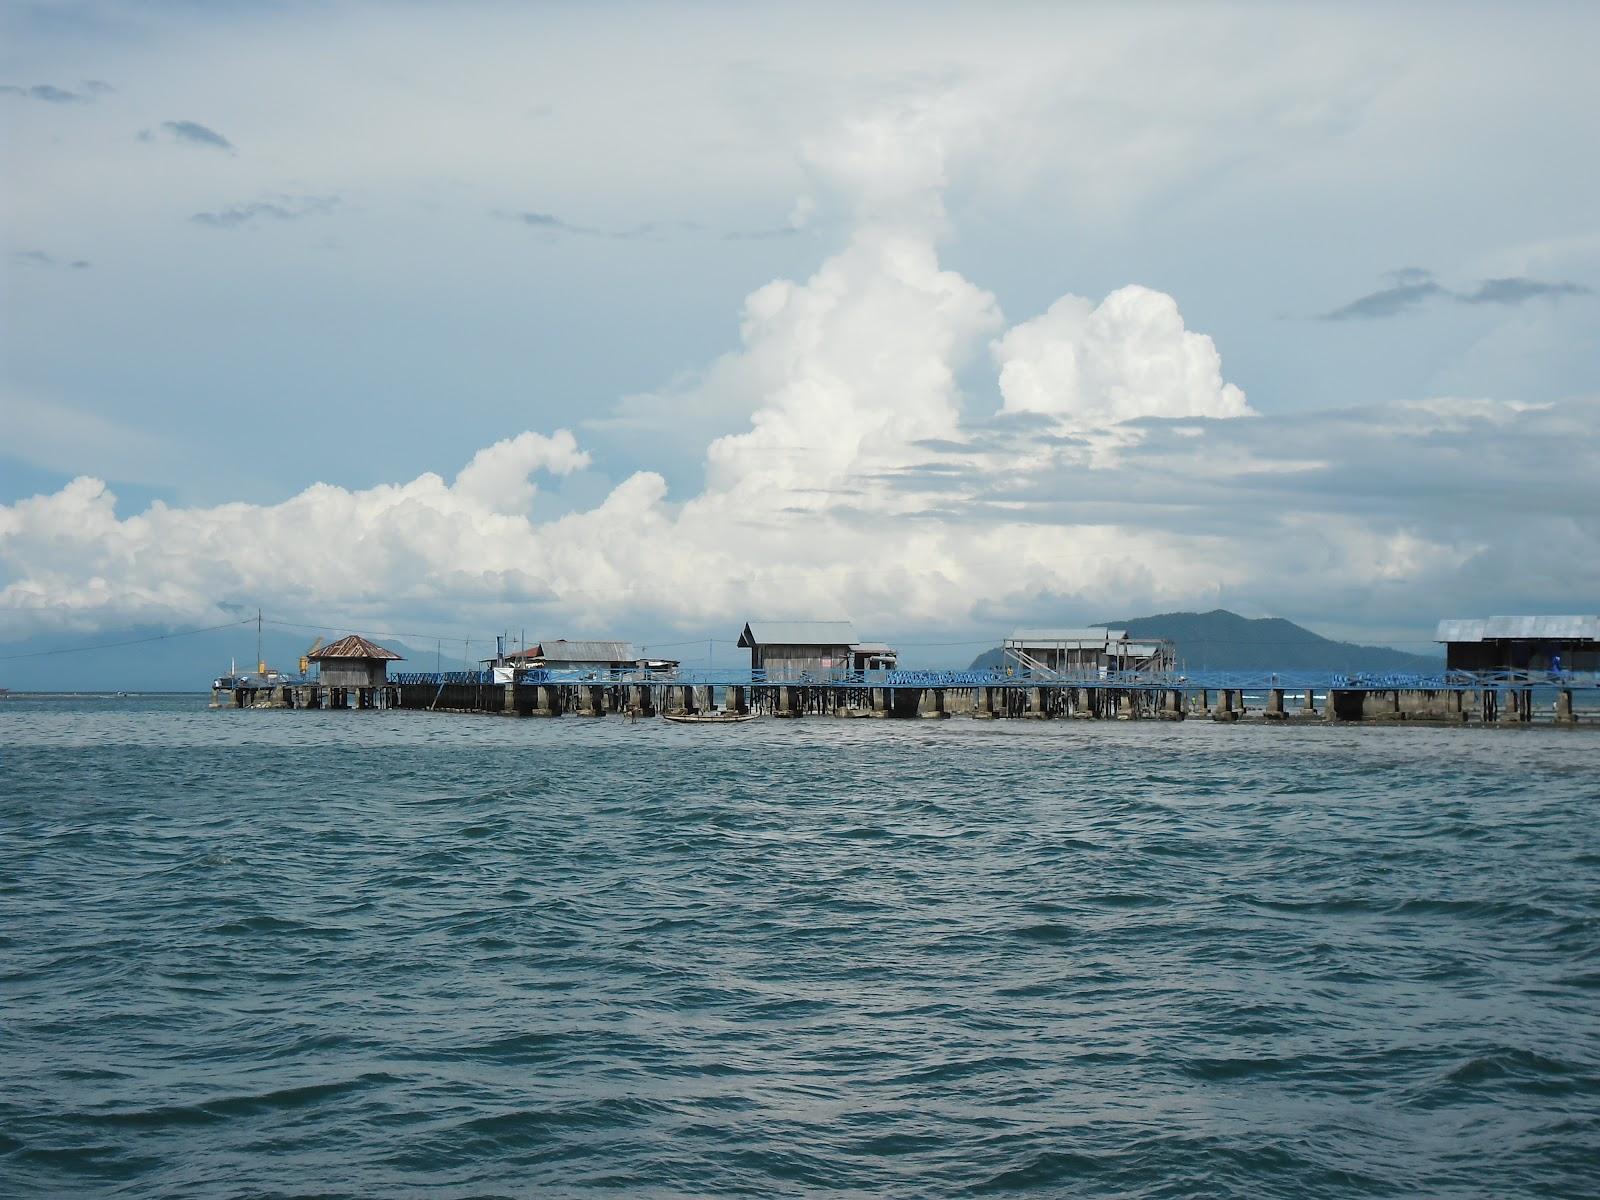 Jayapura Indonesia  city photos : SOUTHERN CROSS SOJOURN: Cruising Jayapura, Papua, Indonesia